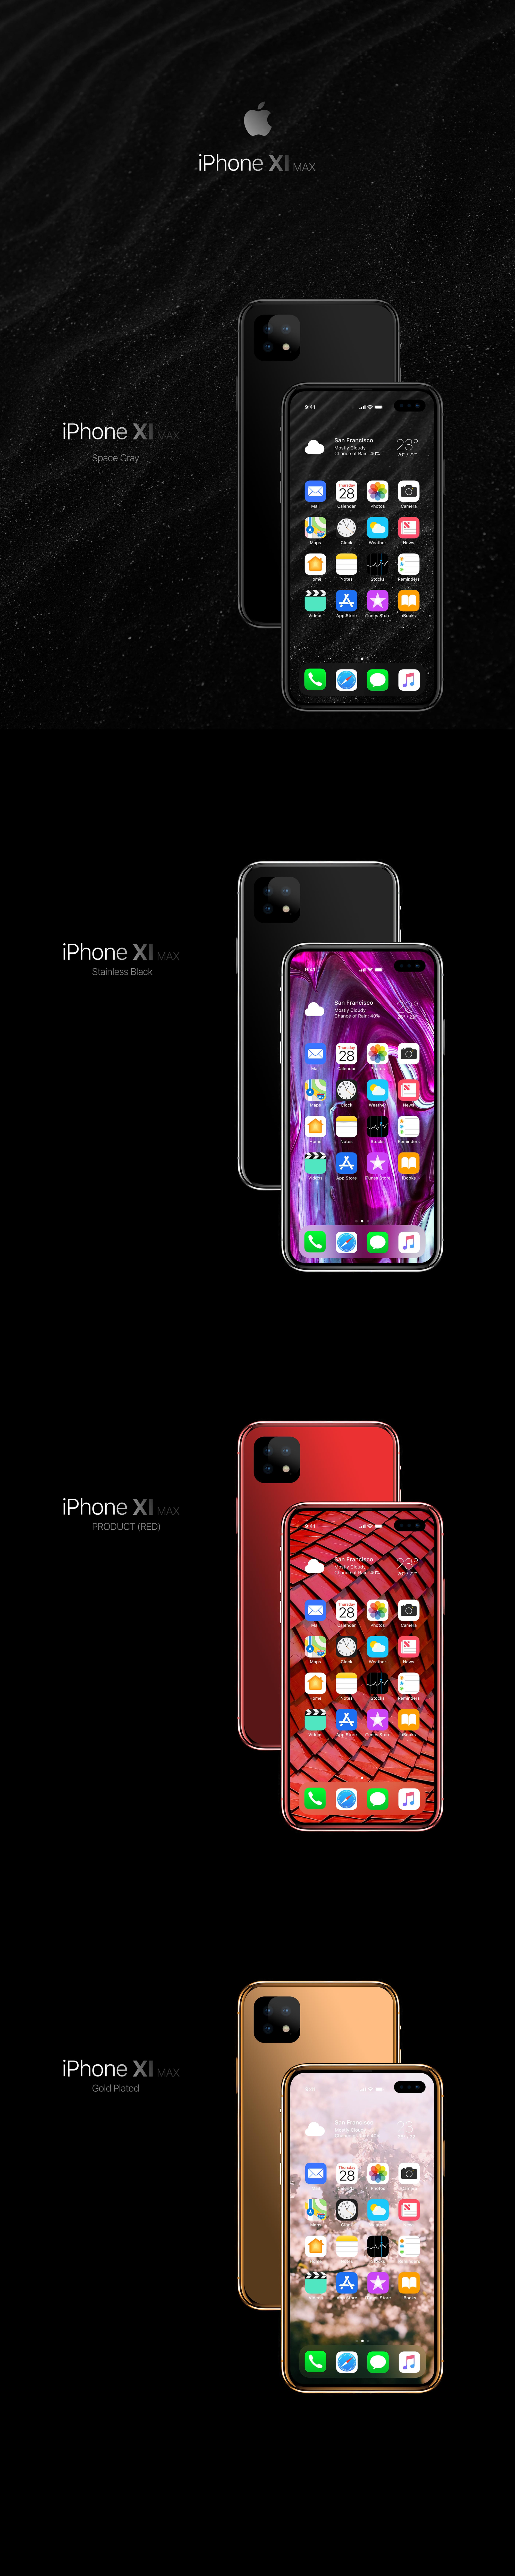 iPhone XI concept hole